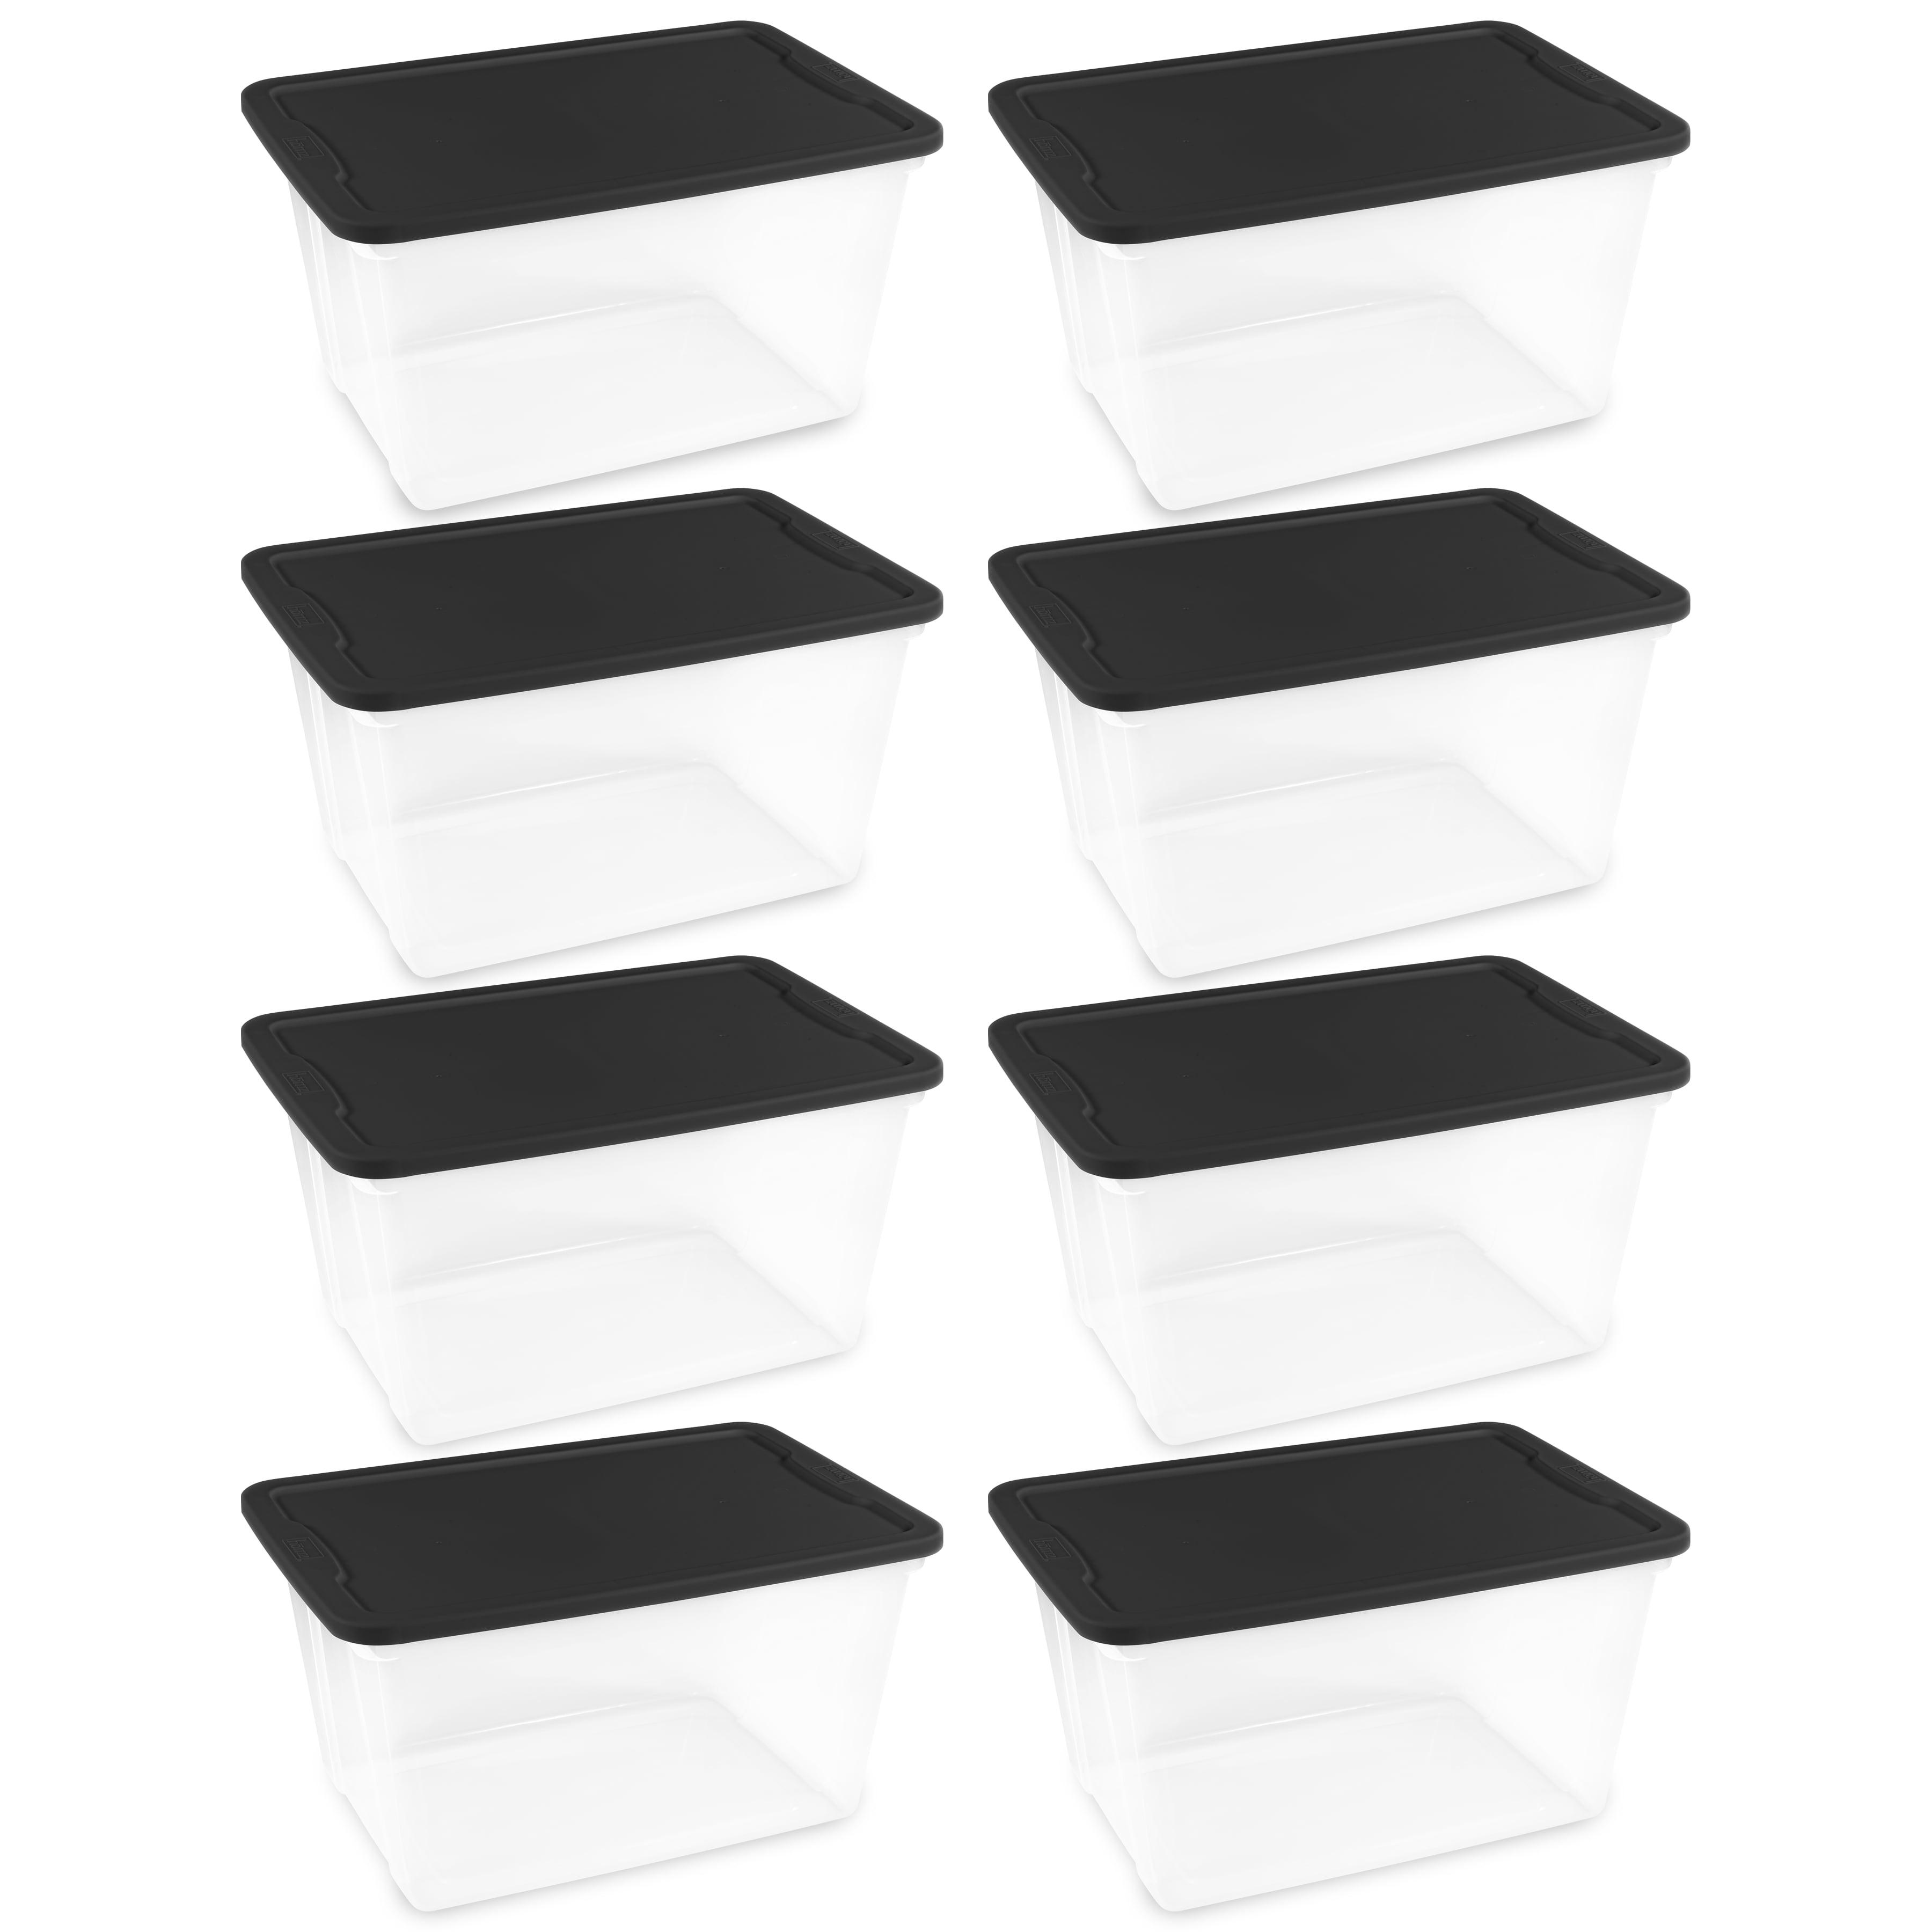 Homz 56 Qt Plastic Storage Tote, Multiple Colors Available (Set of 8)